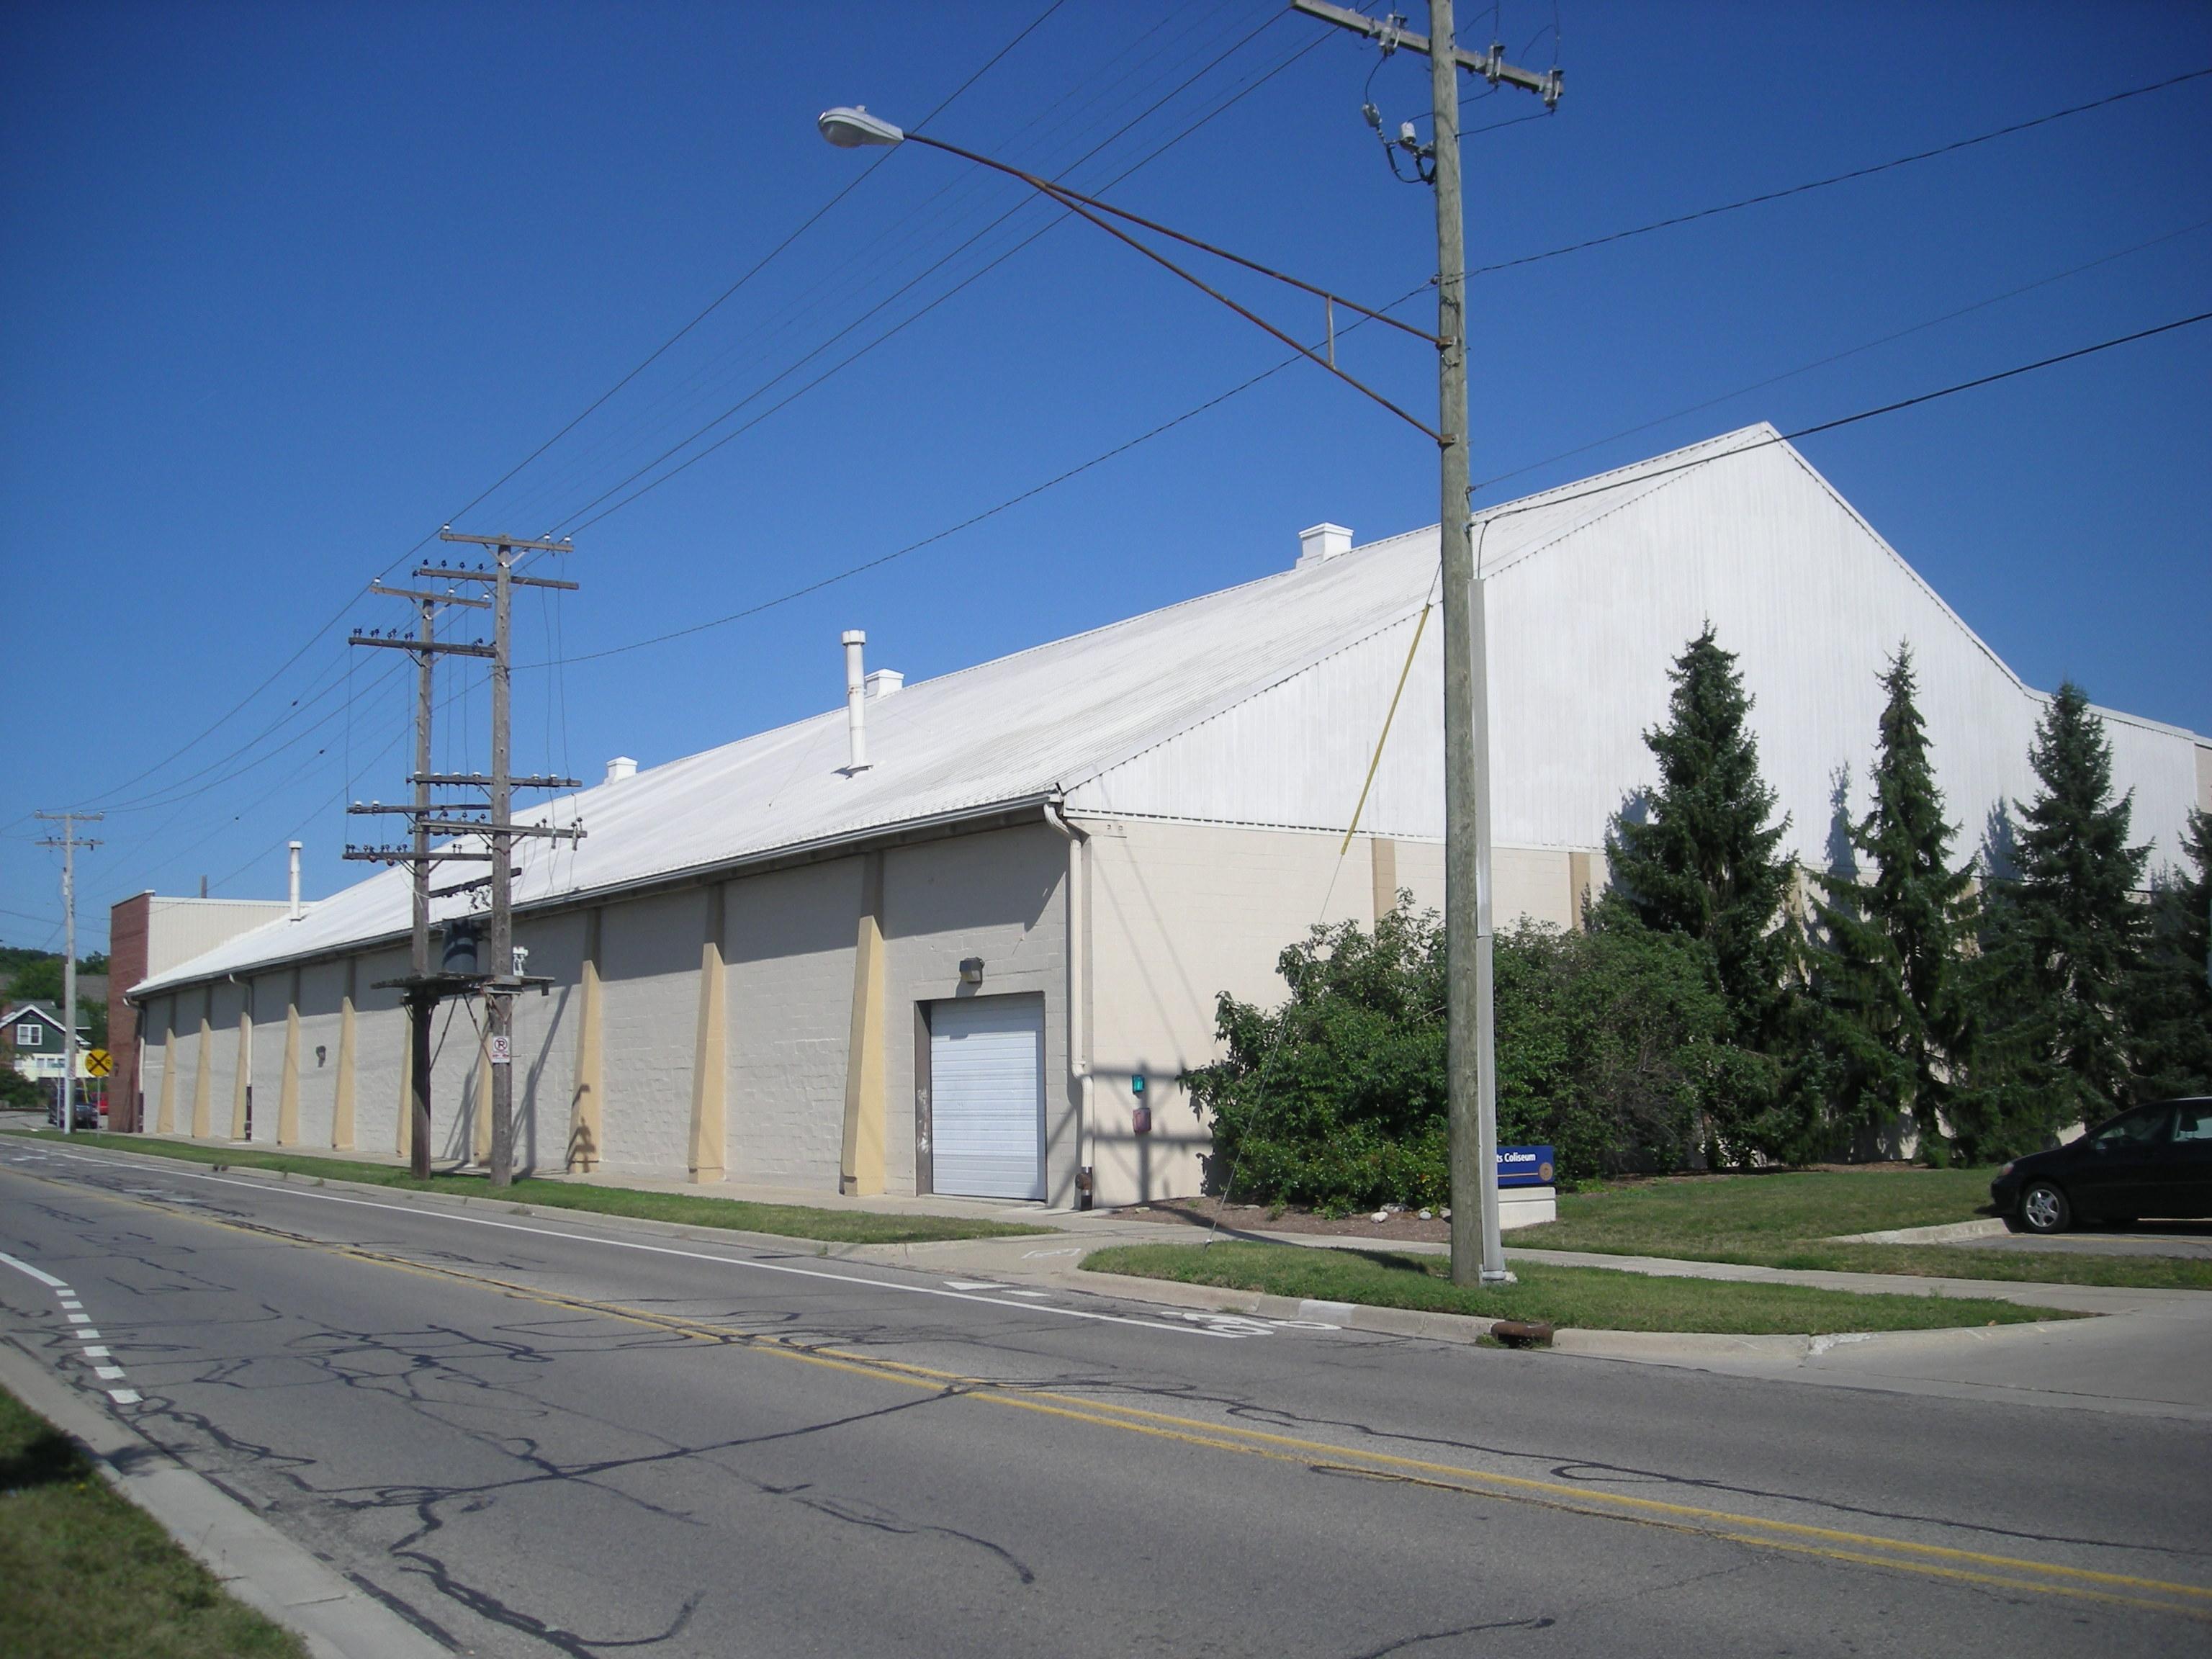 Weinberg's Coliseum